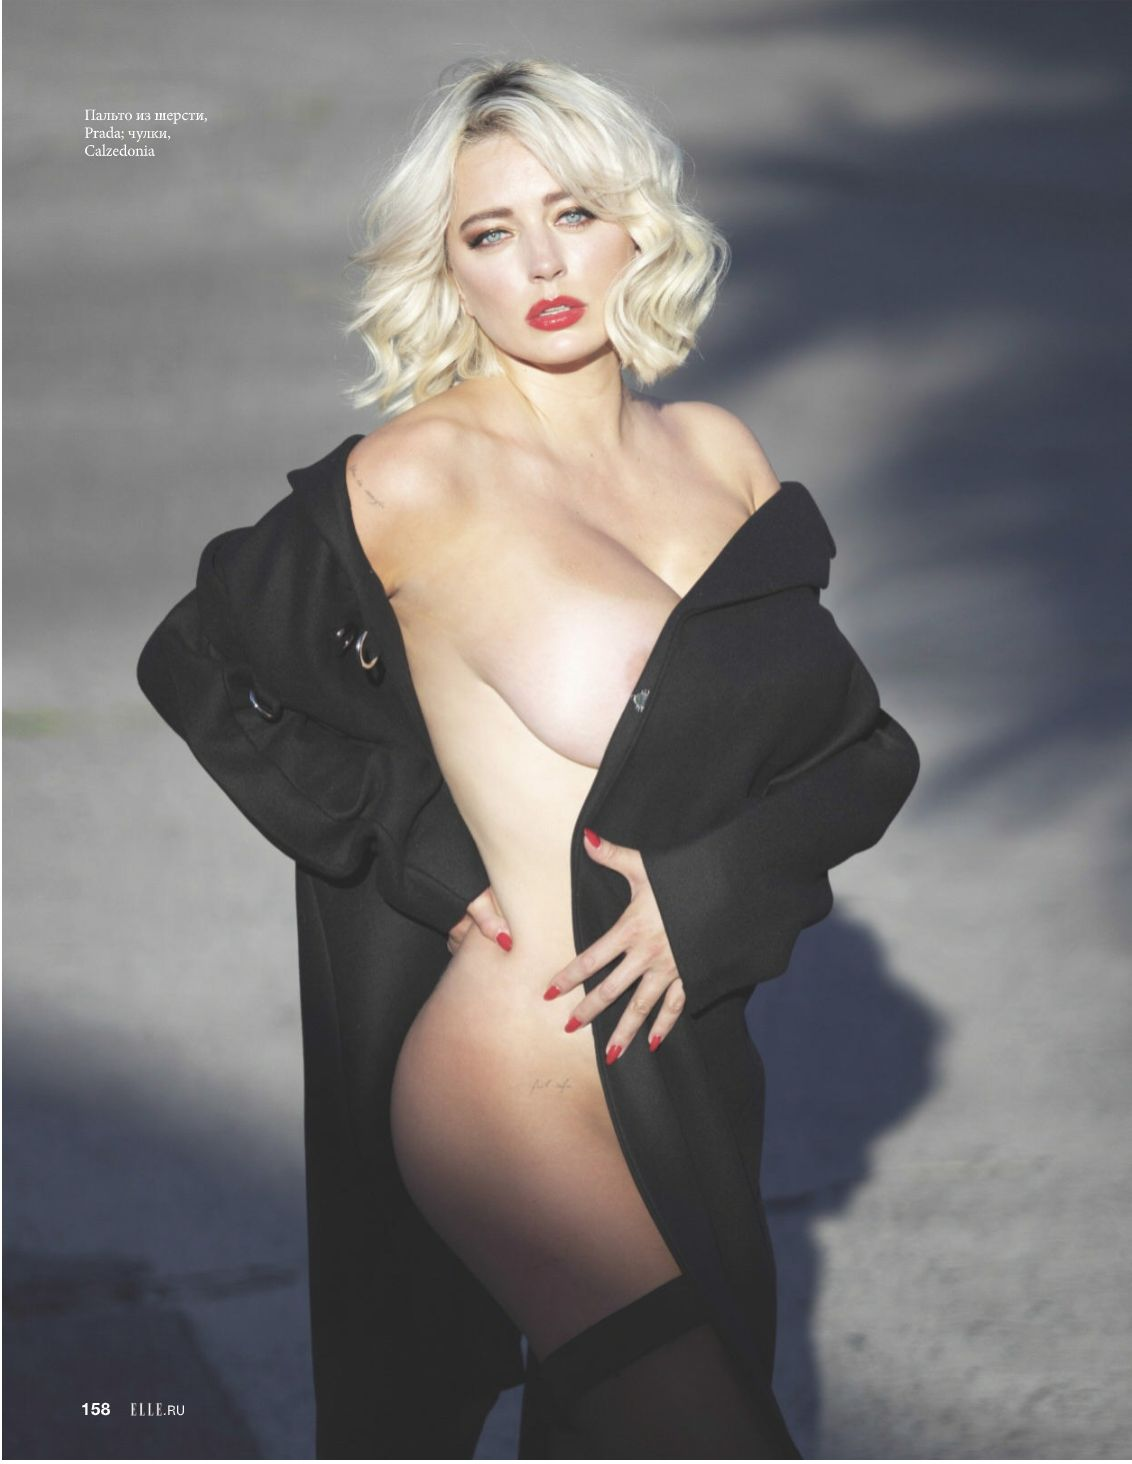 0906093204038_10_Caroline-Vreeland-Nude-Sexy-TheFappeningBlog.com-11.jpg